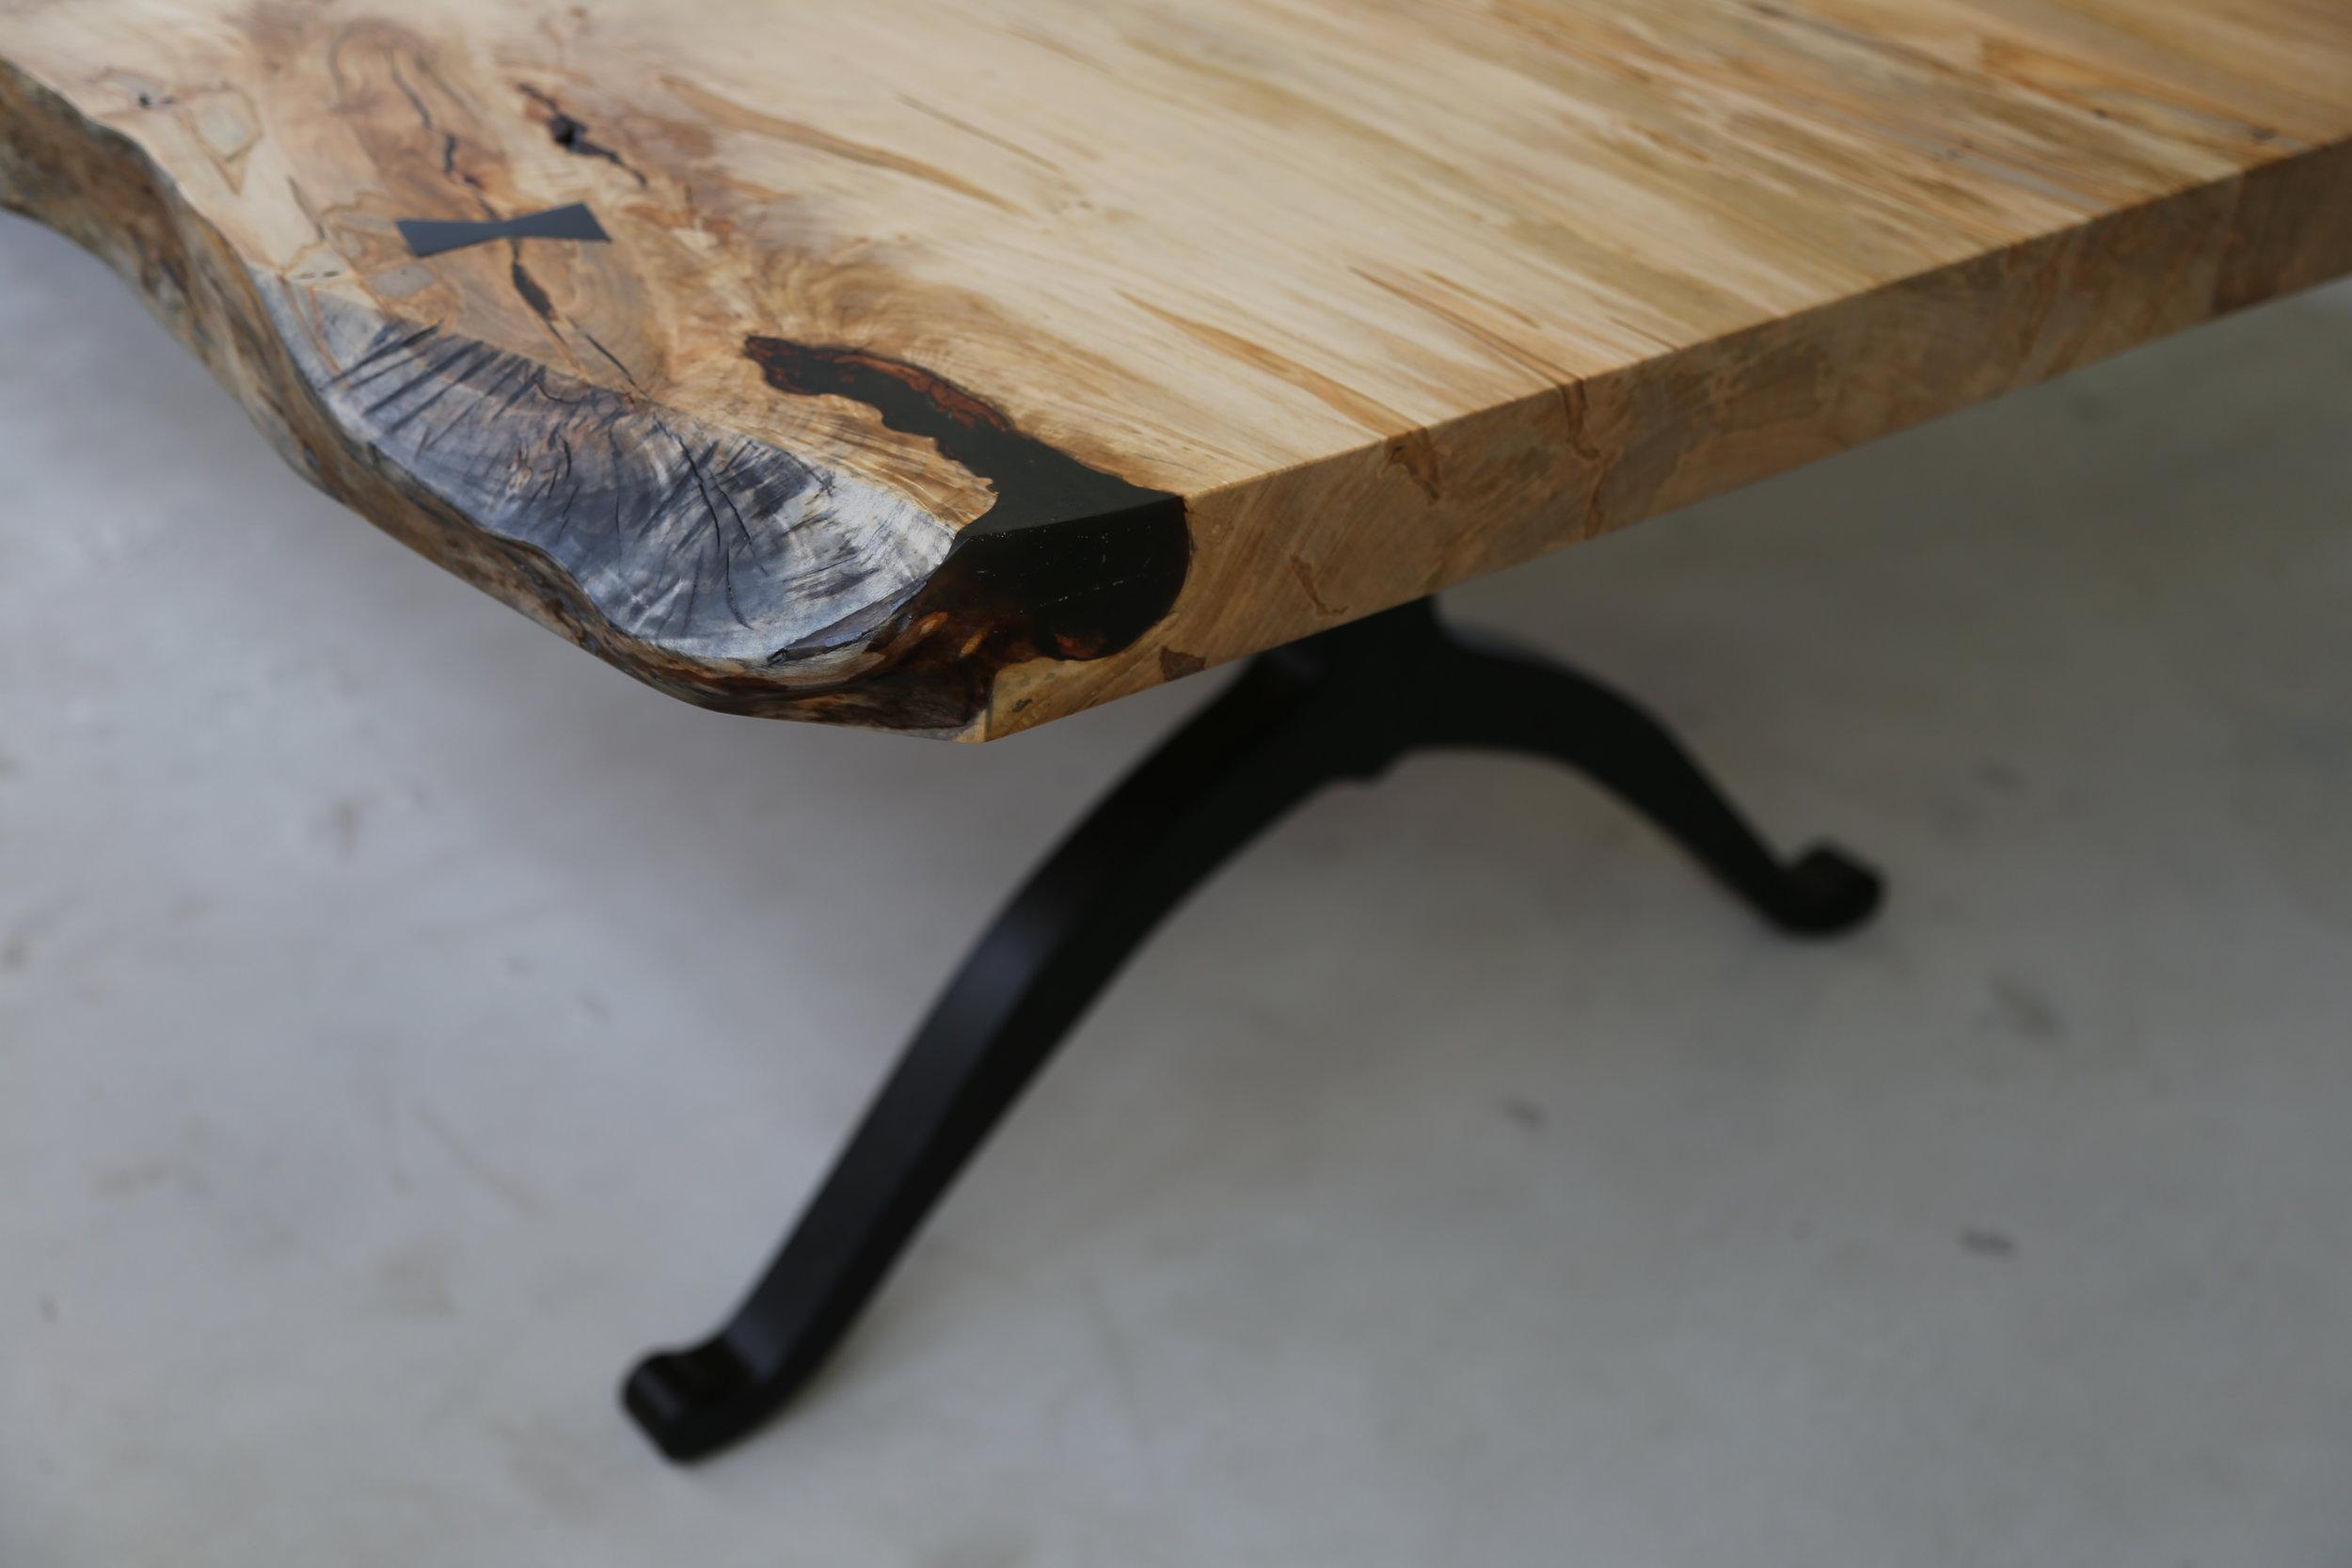 Live Edge Ambrosia Maple Dining Table